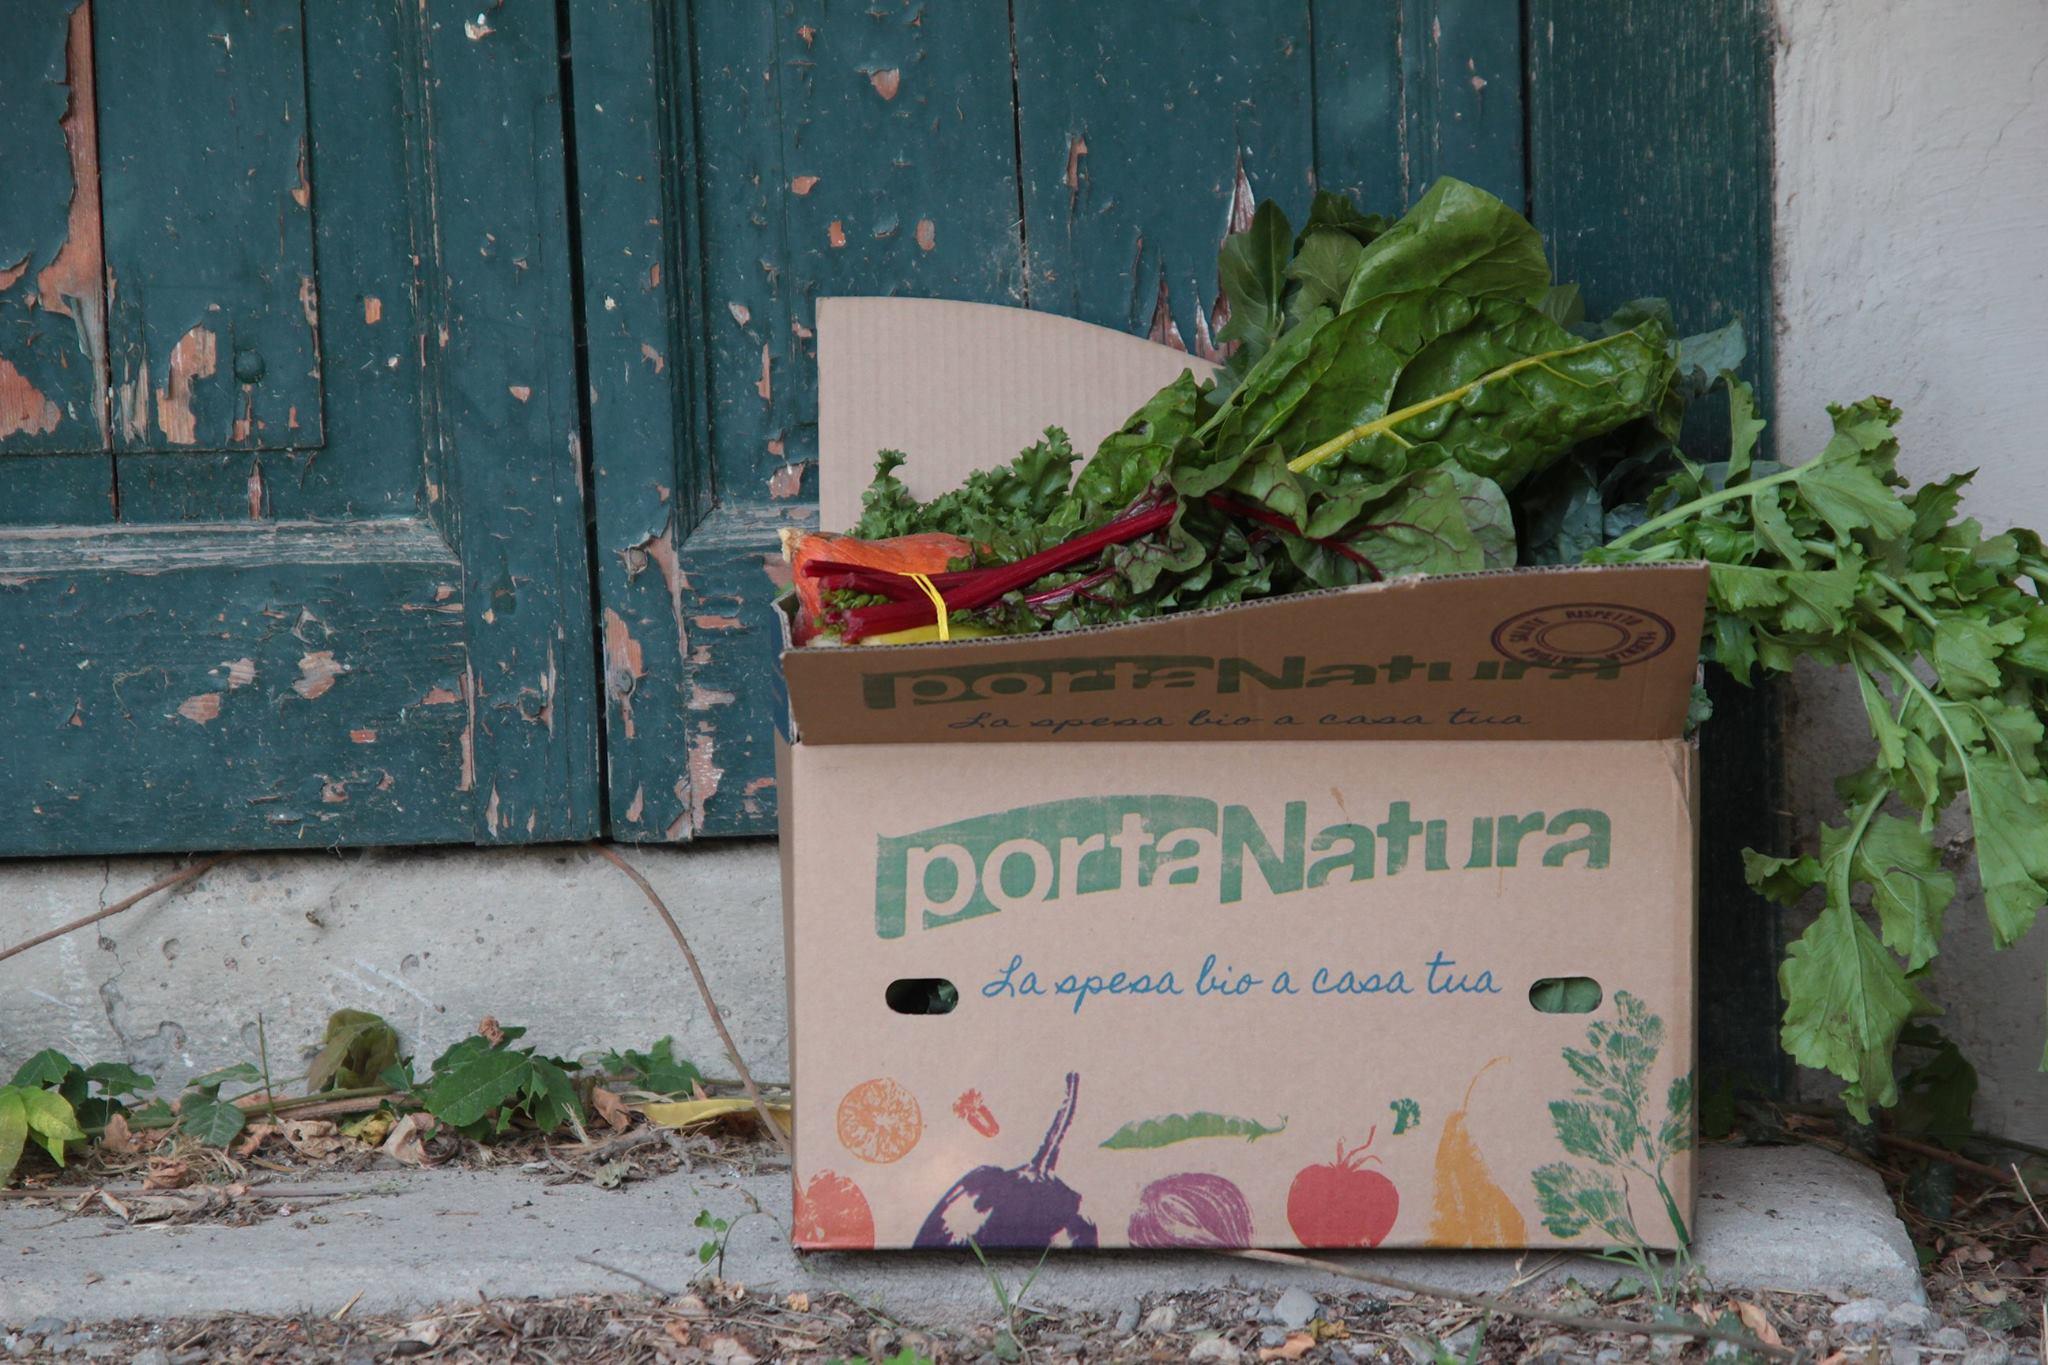 Cassetta di frutta e verdura biologica a domicilio PortaNatura